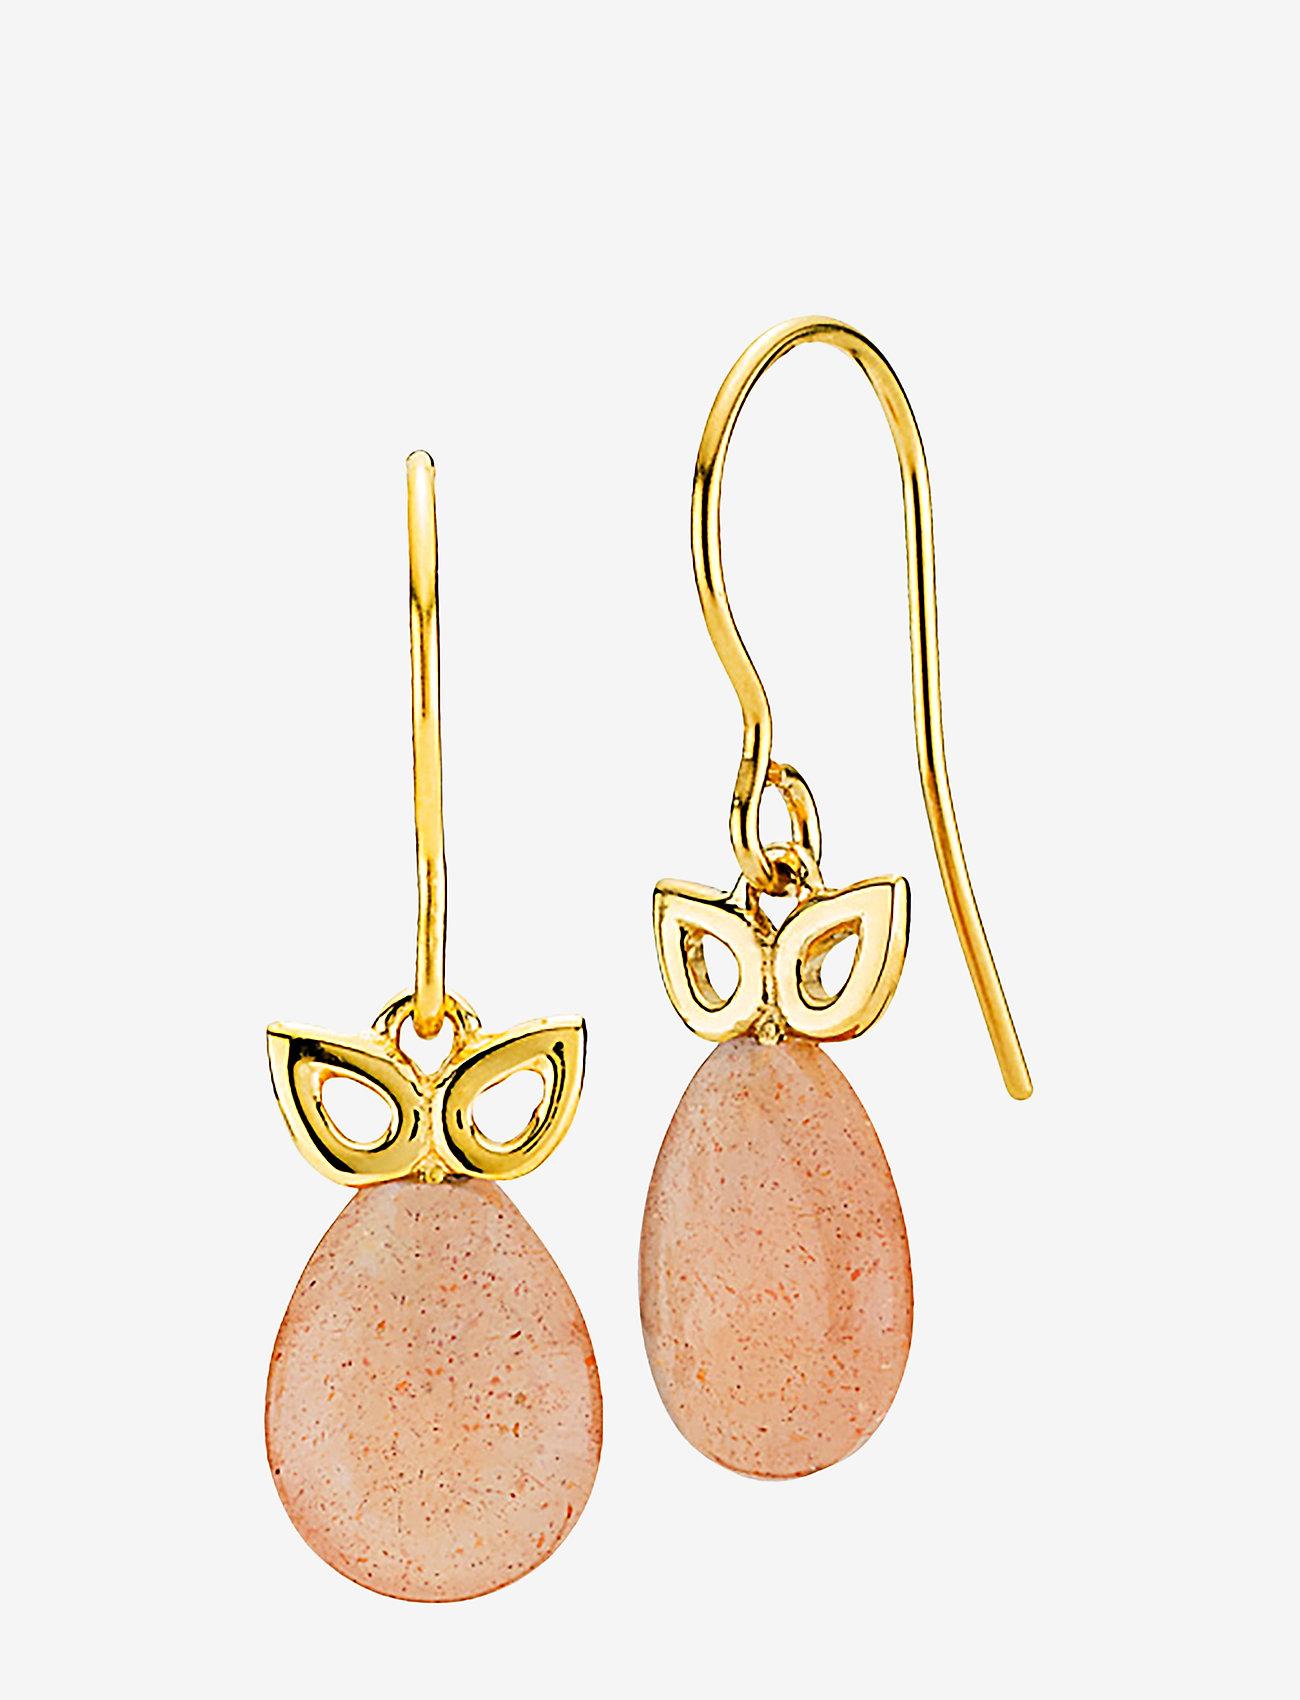 Izabel Camille - Scarlet - pendant - shiny gold, peach